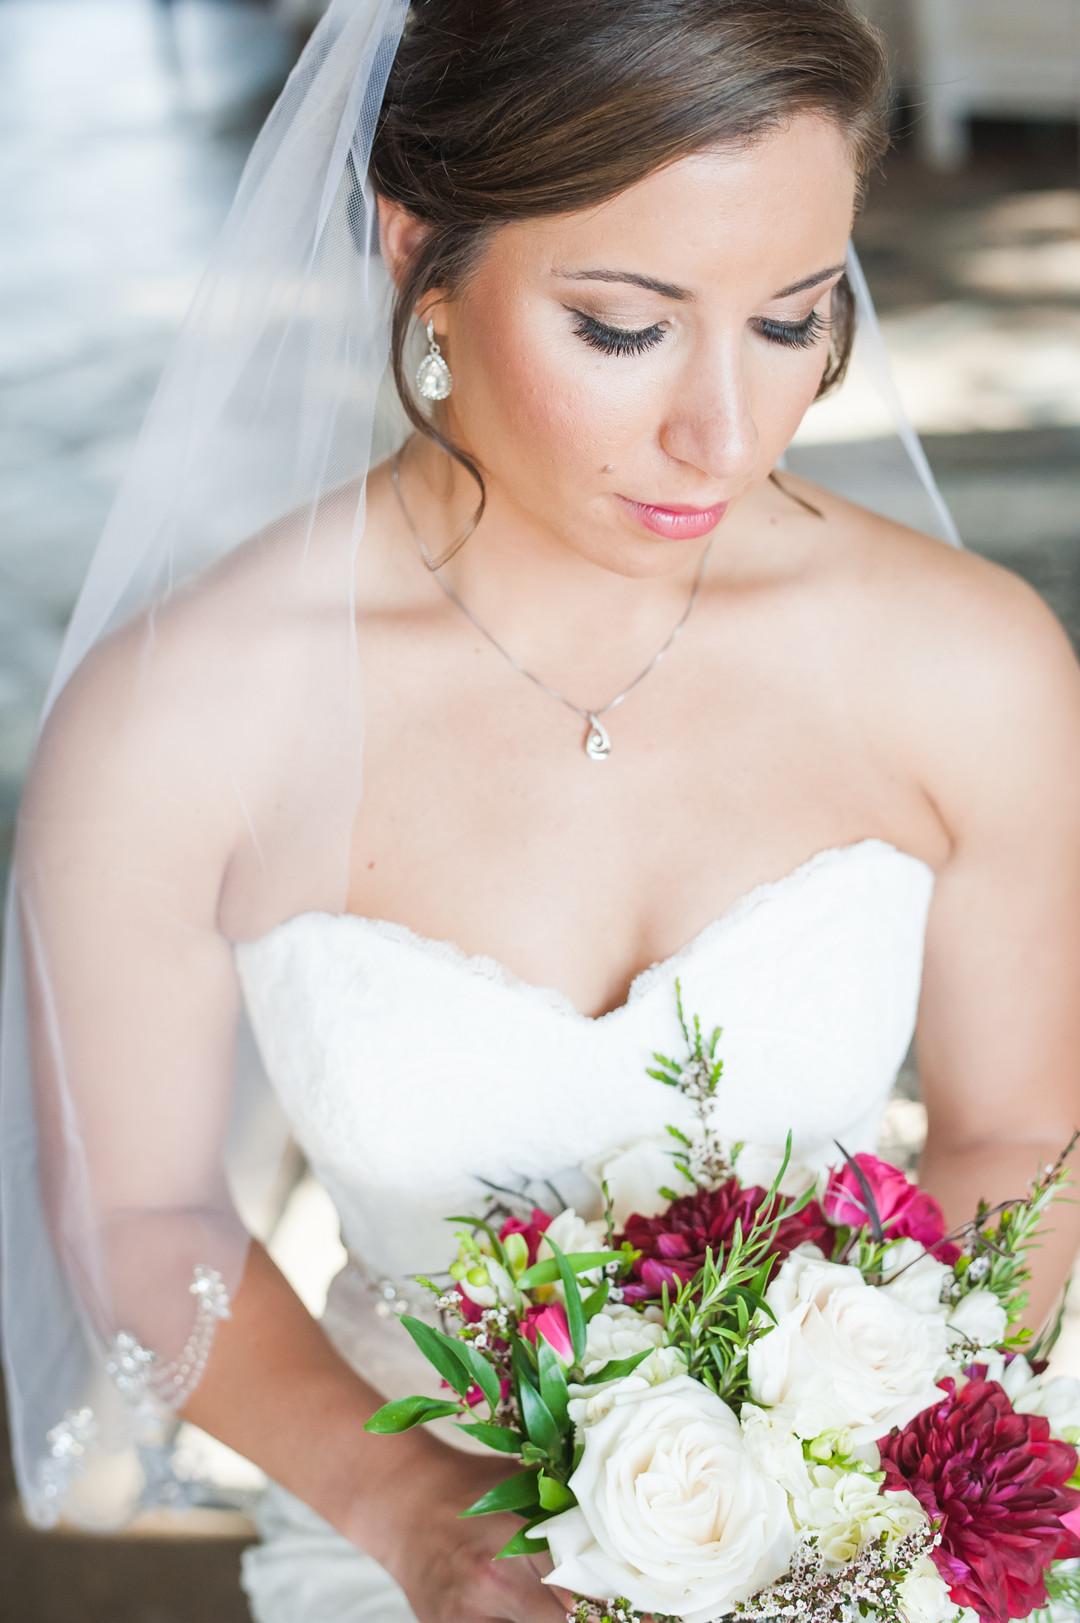 Natural Bridal Make up Chicago Wedding Elite Photo